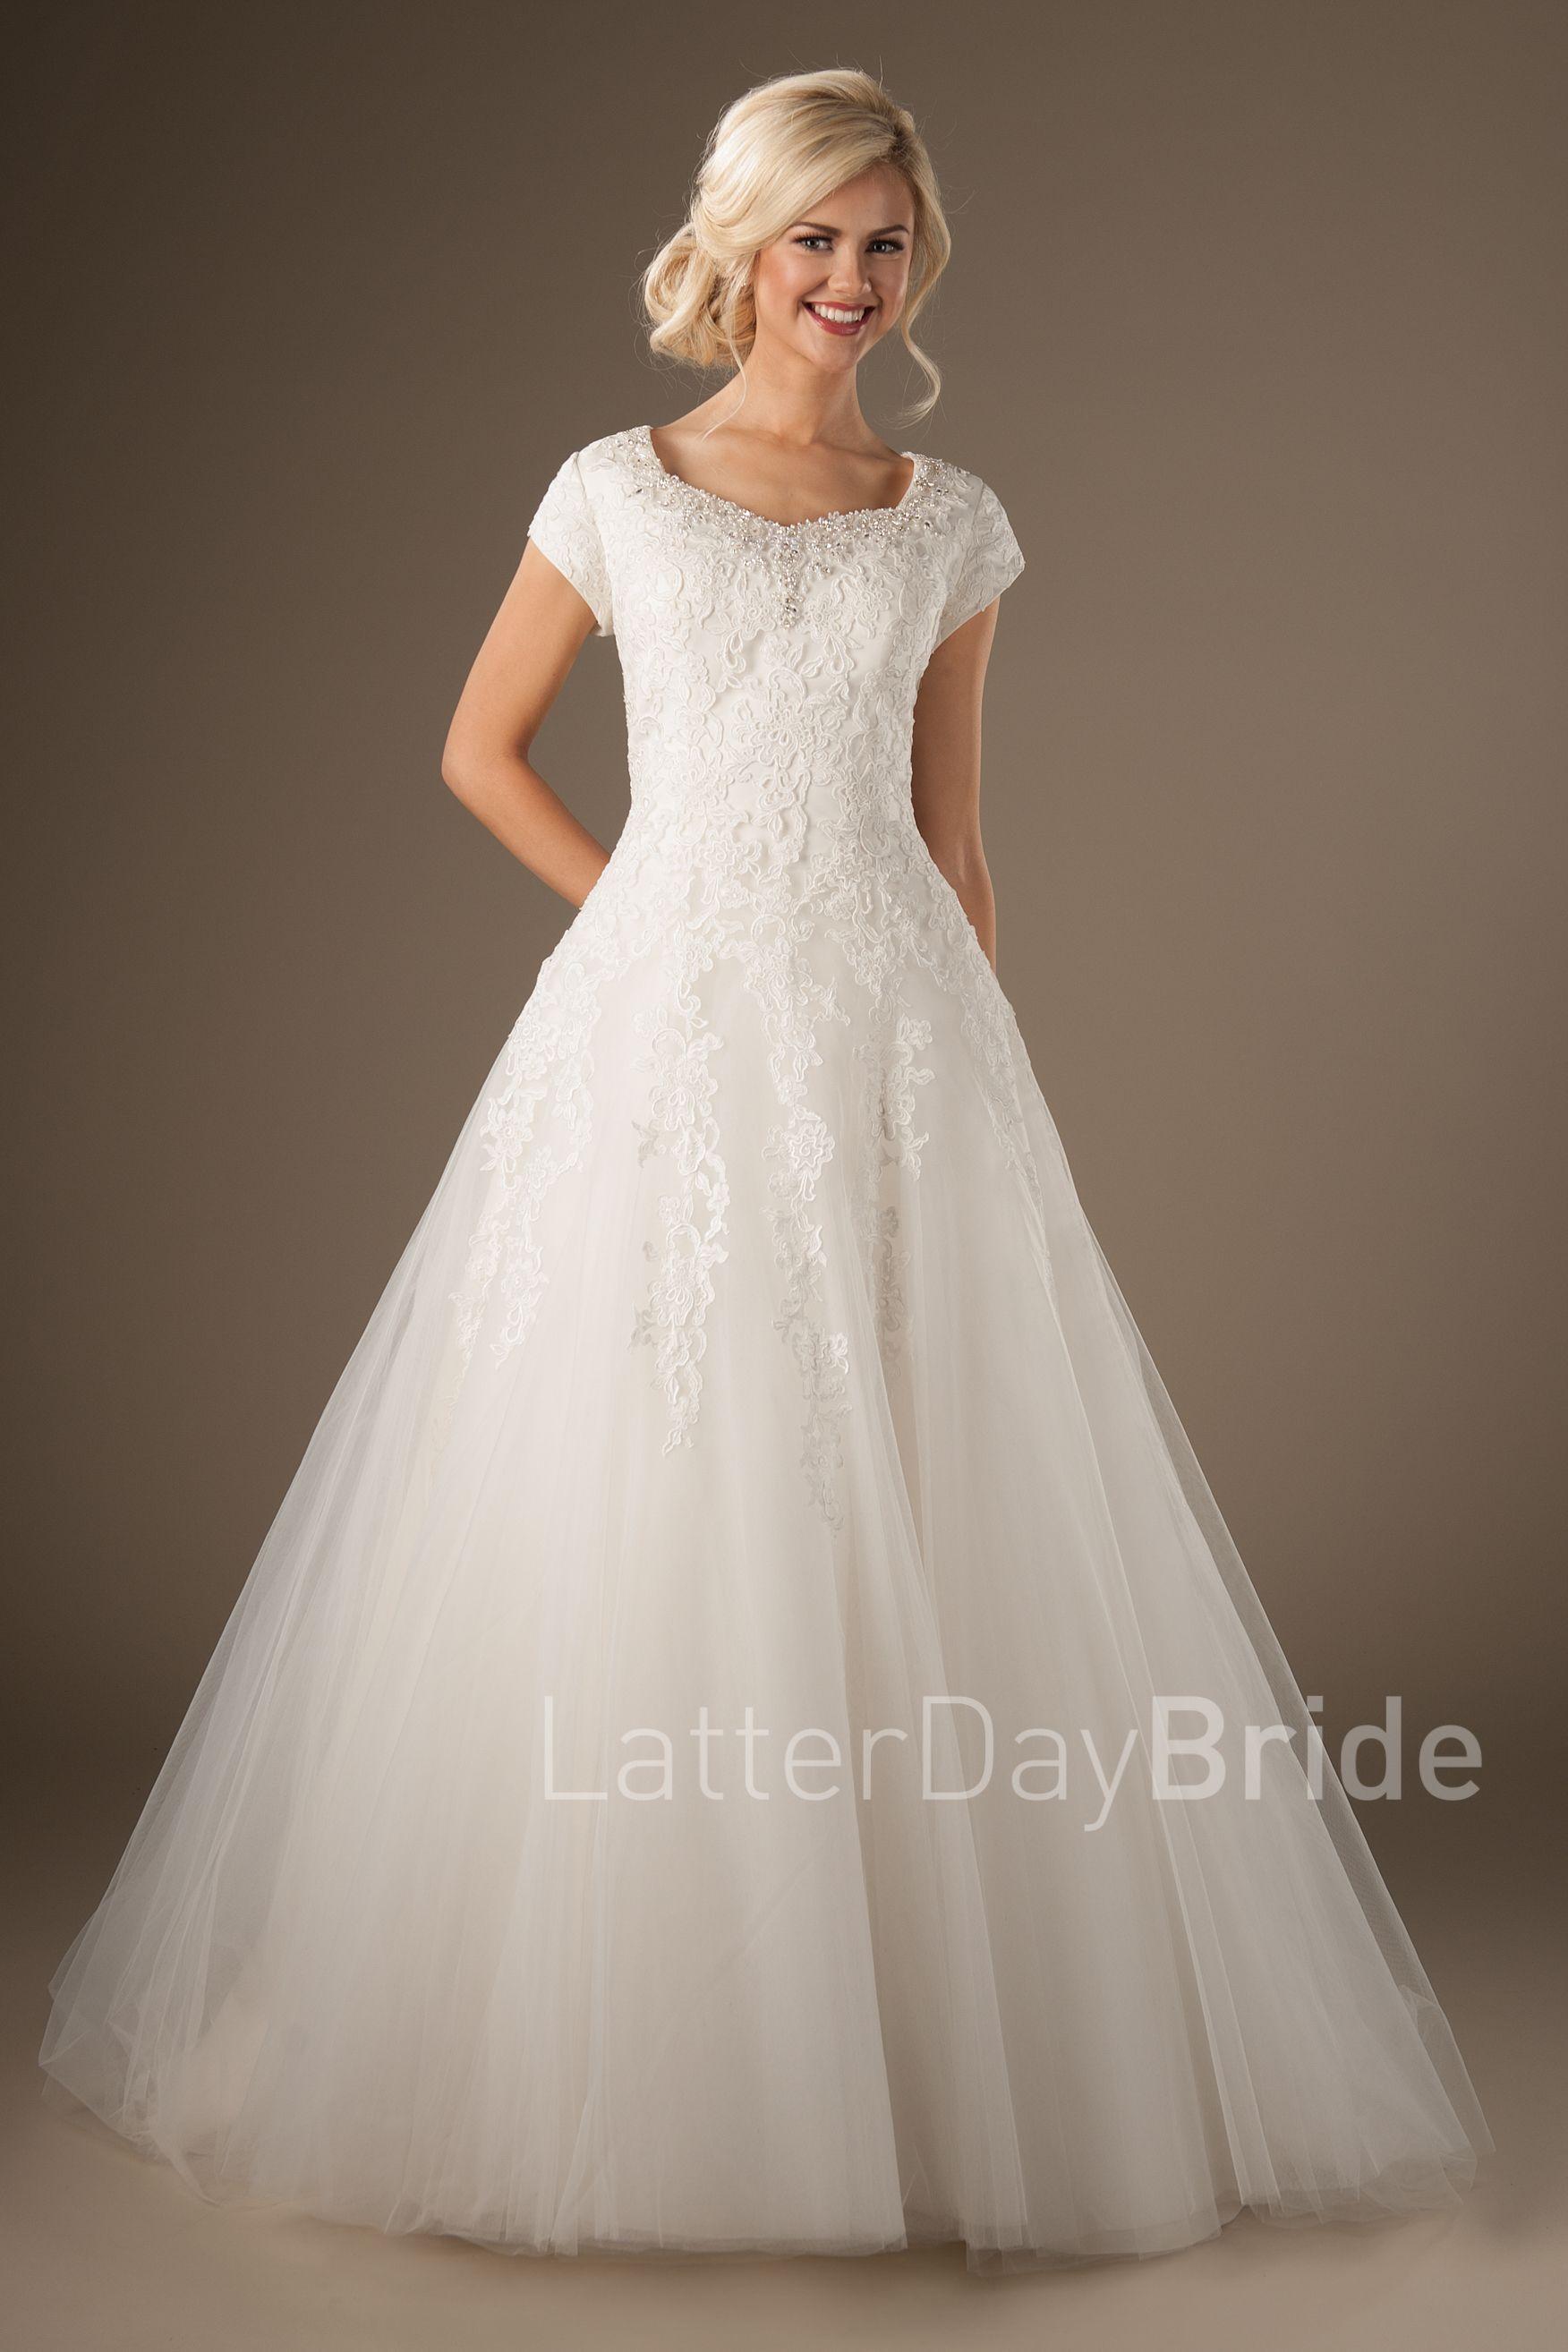 Lorelai- Modest Ball Gown- $1305 Latterday Bride Collection, found ...